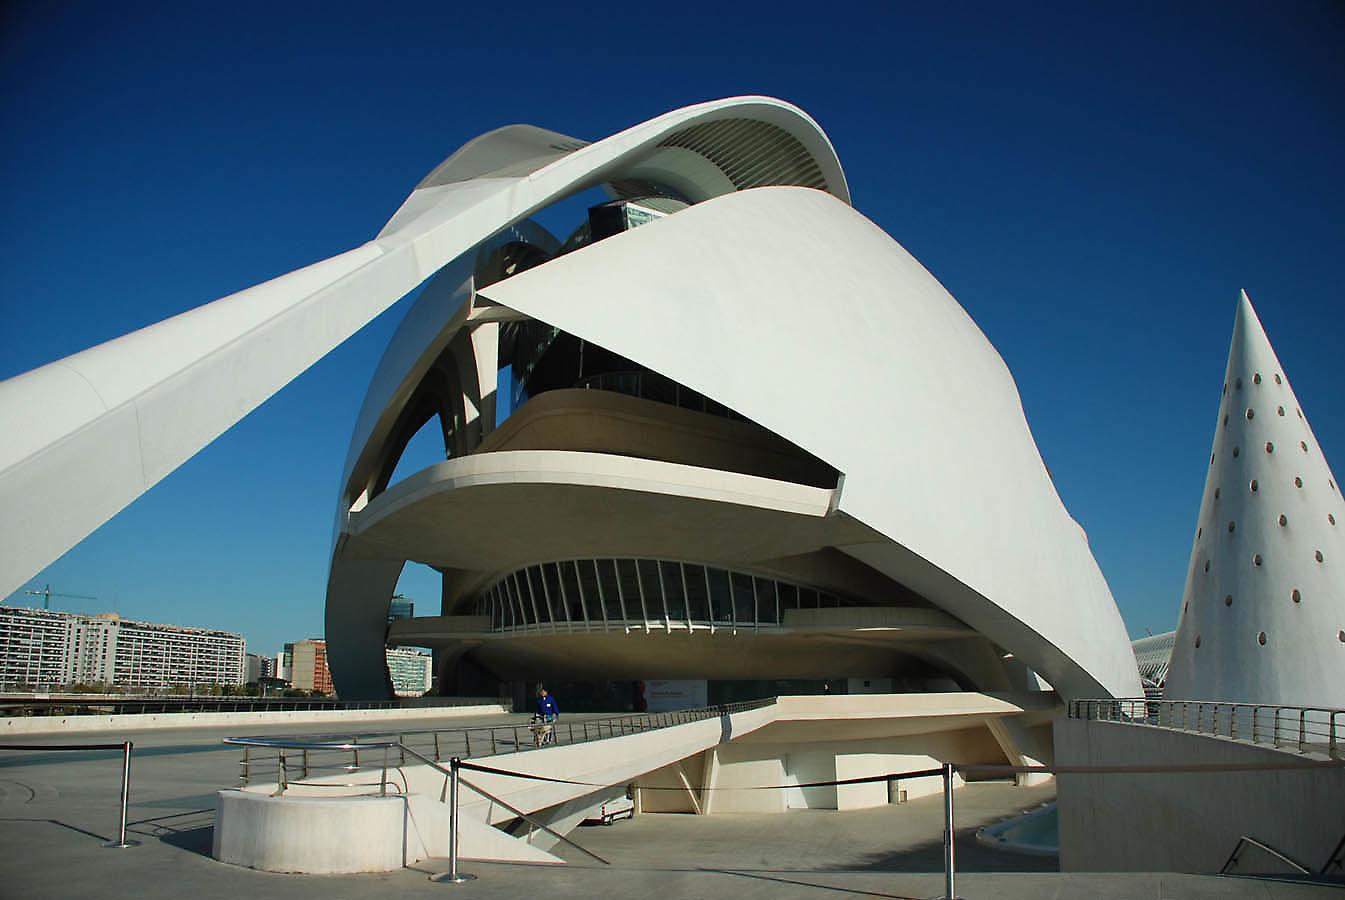 Beda ingenier a arquitectura e ingenier a - Arquitectura e ingenieria ...